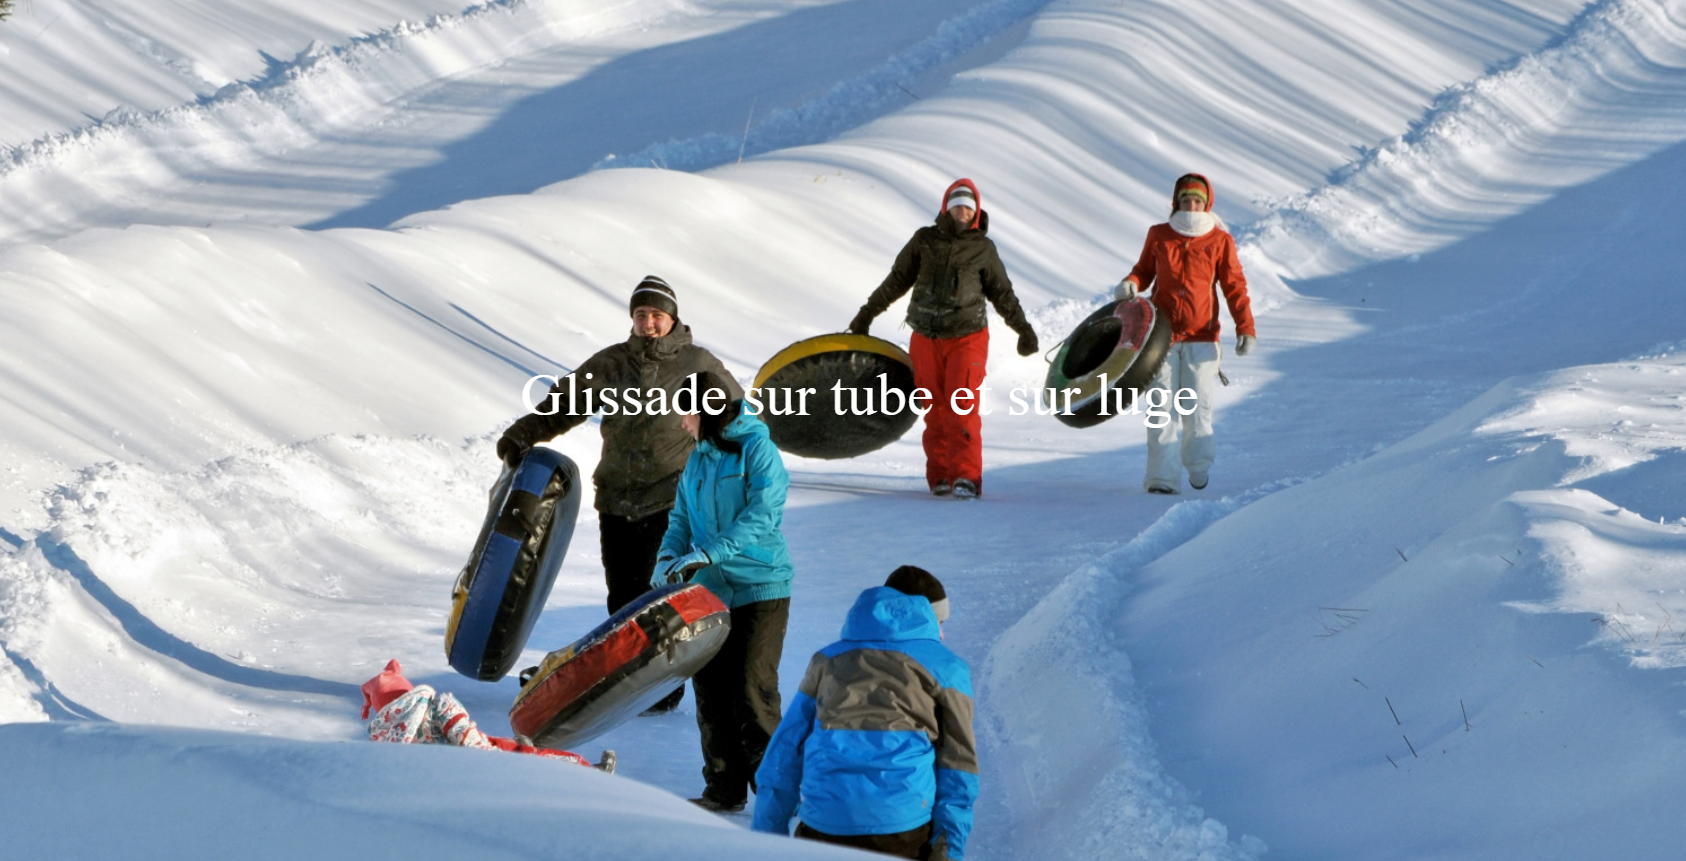 Glissade_sur_tube